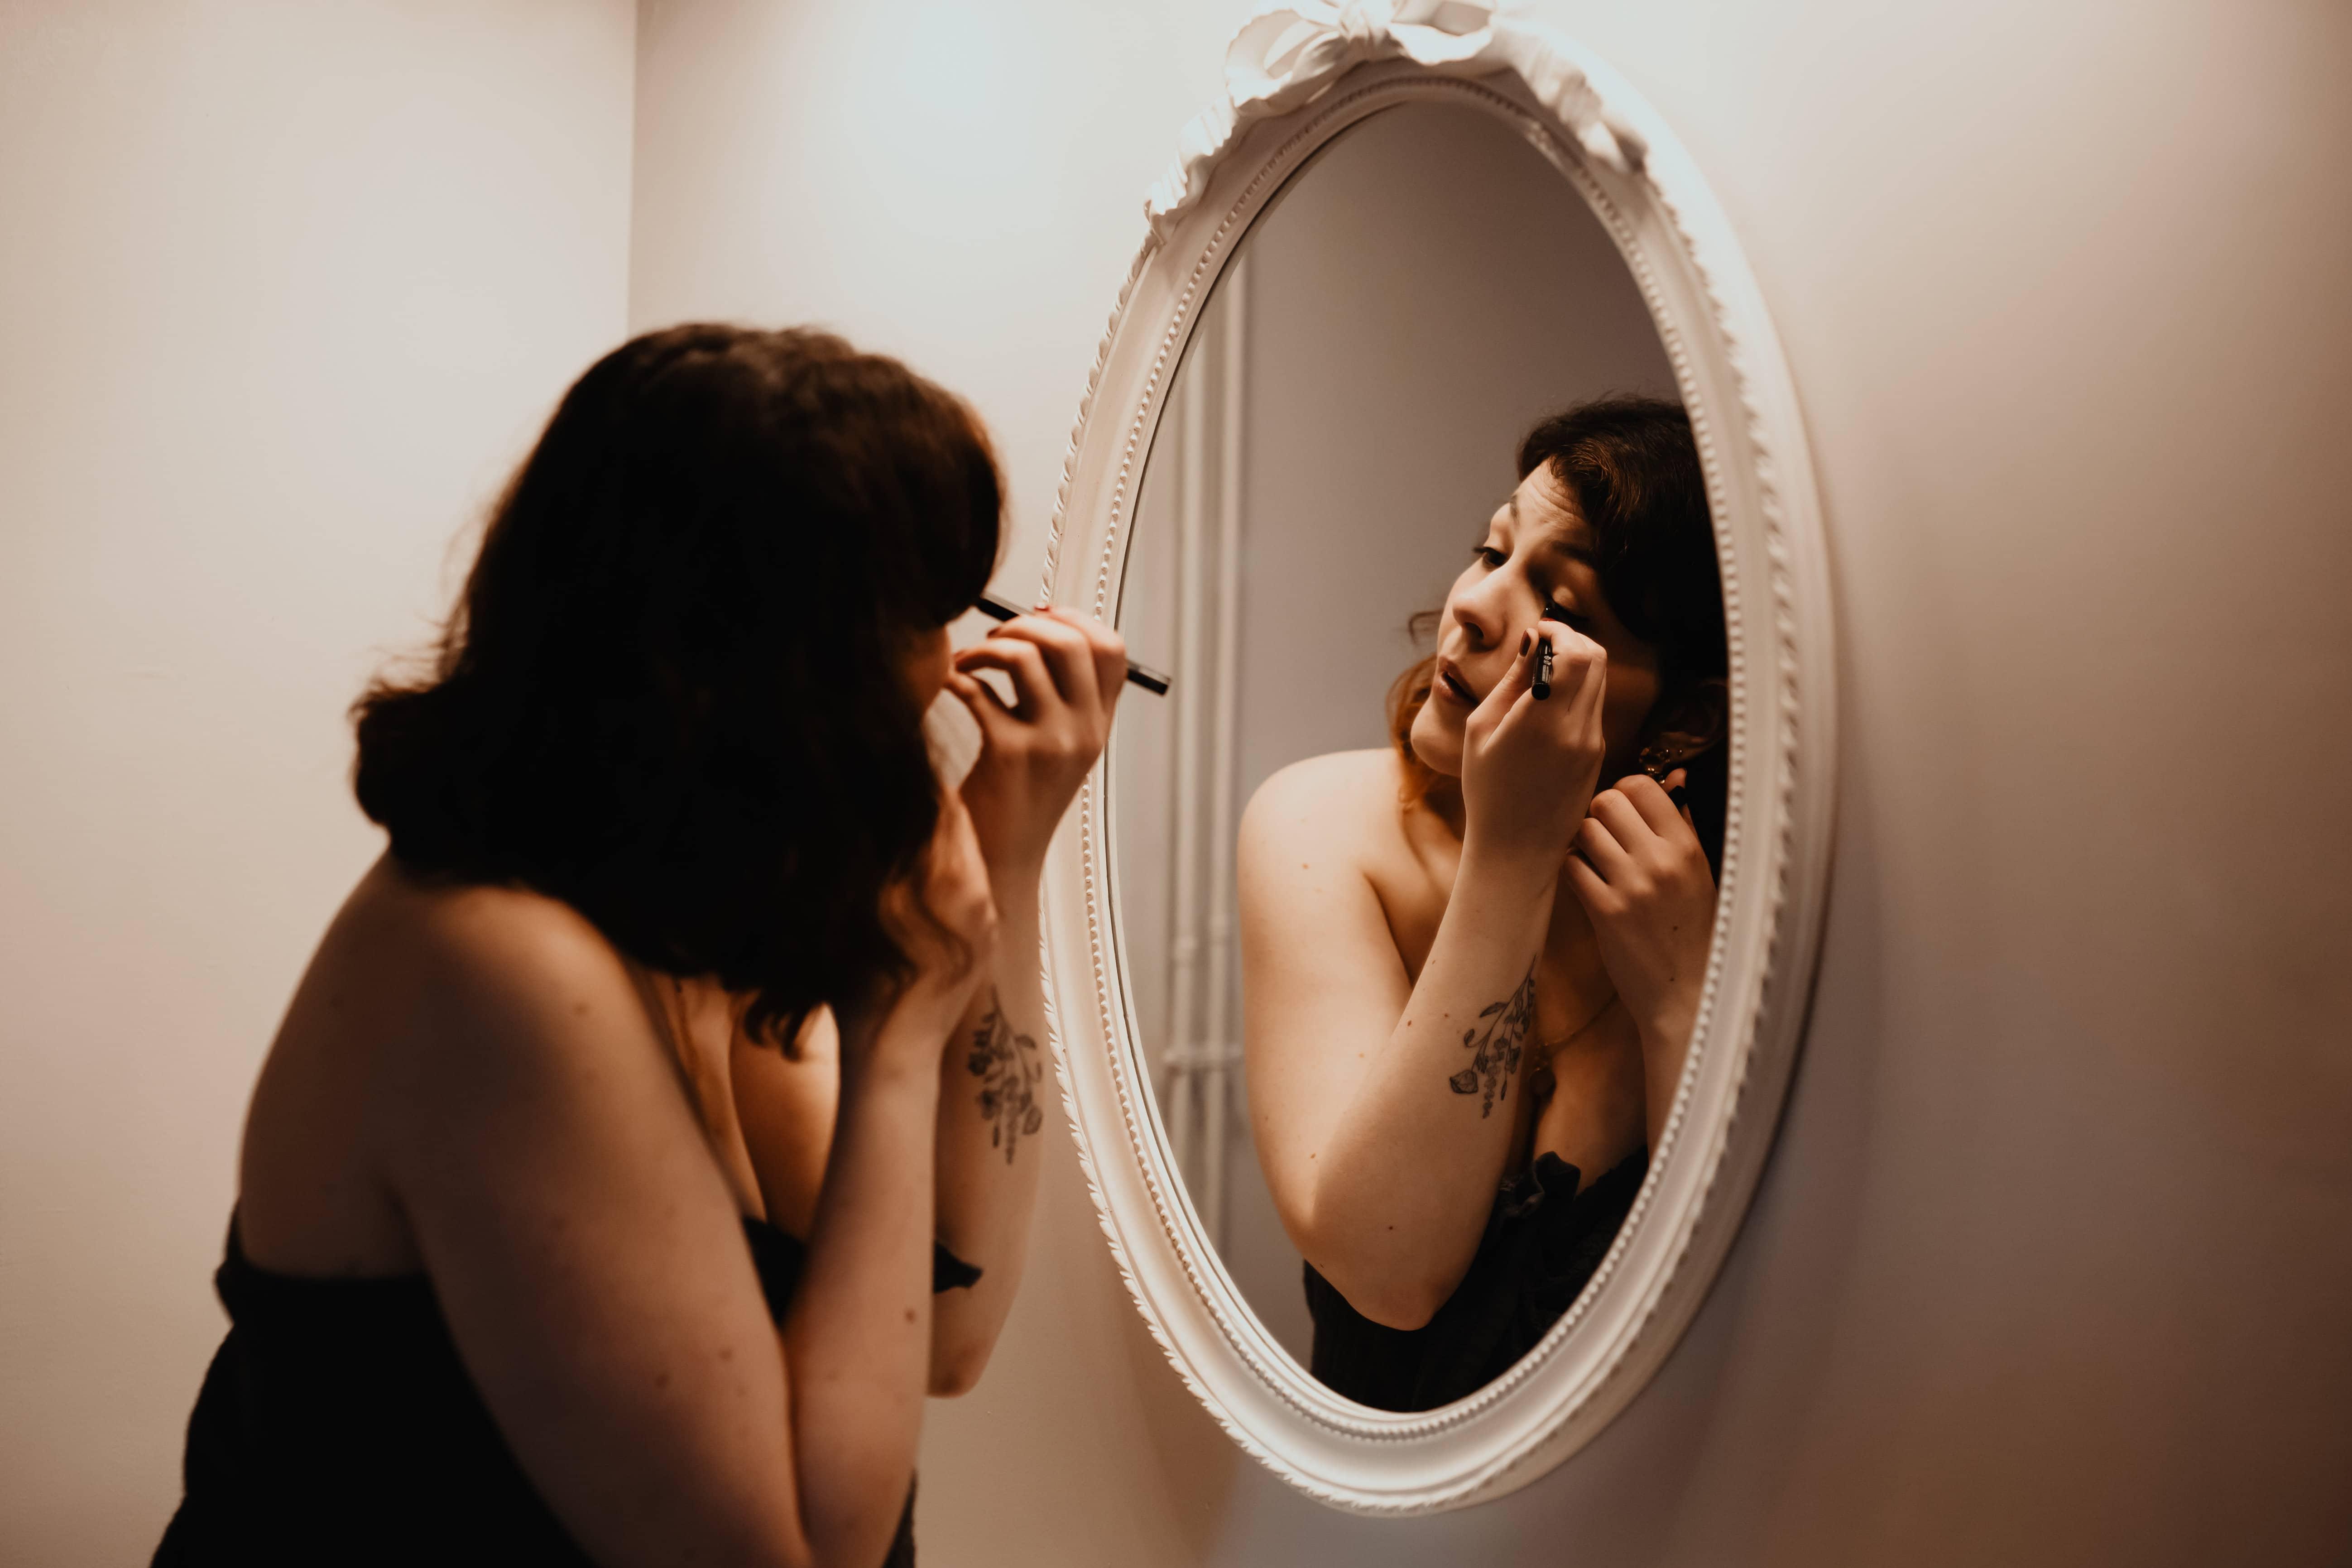 Maquillage de mariage naturel vegan et cruelty-free : produits, routine et conseils